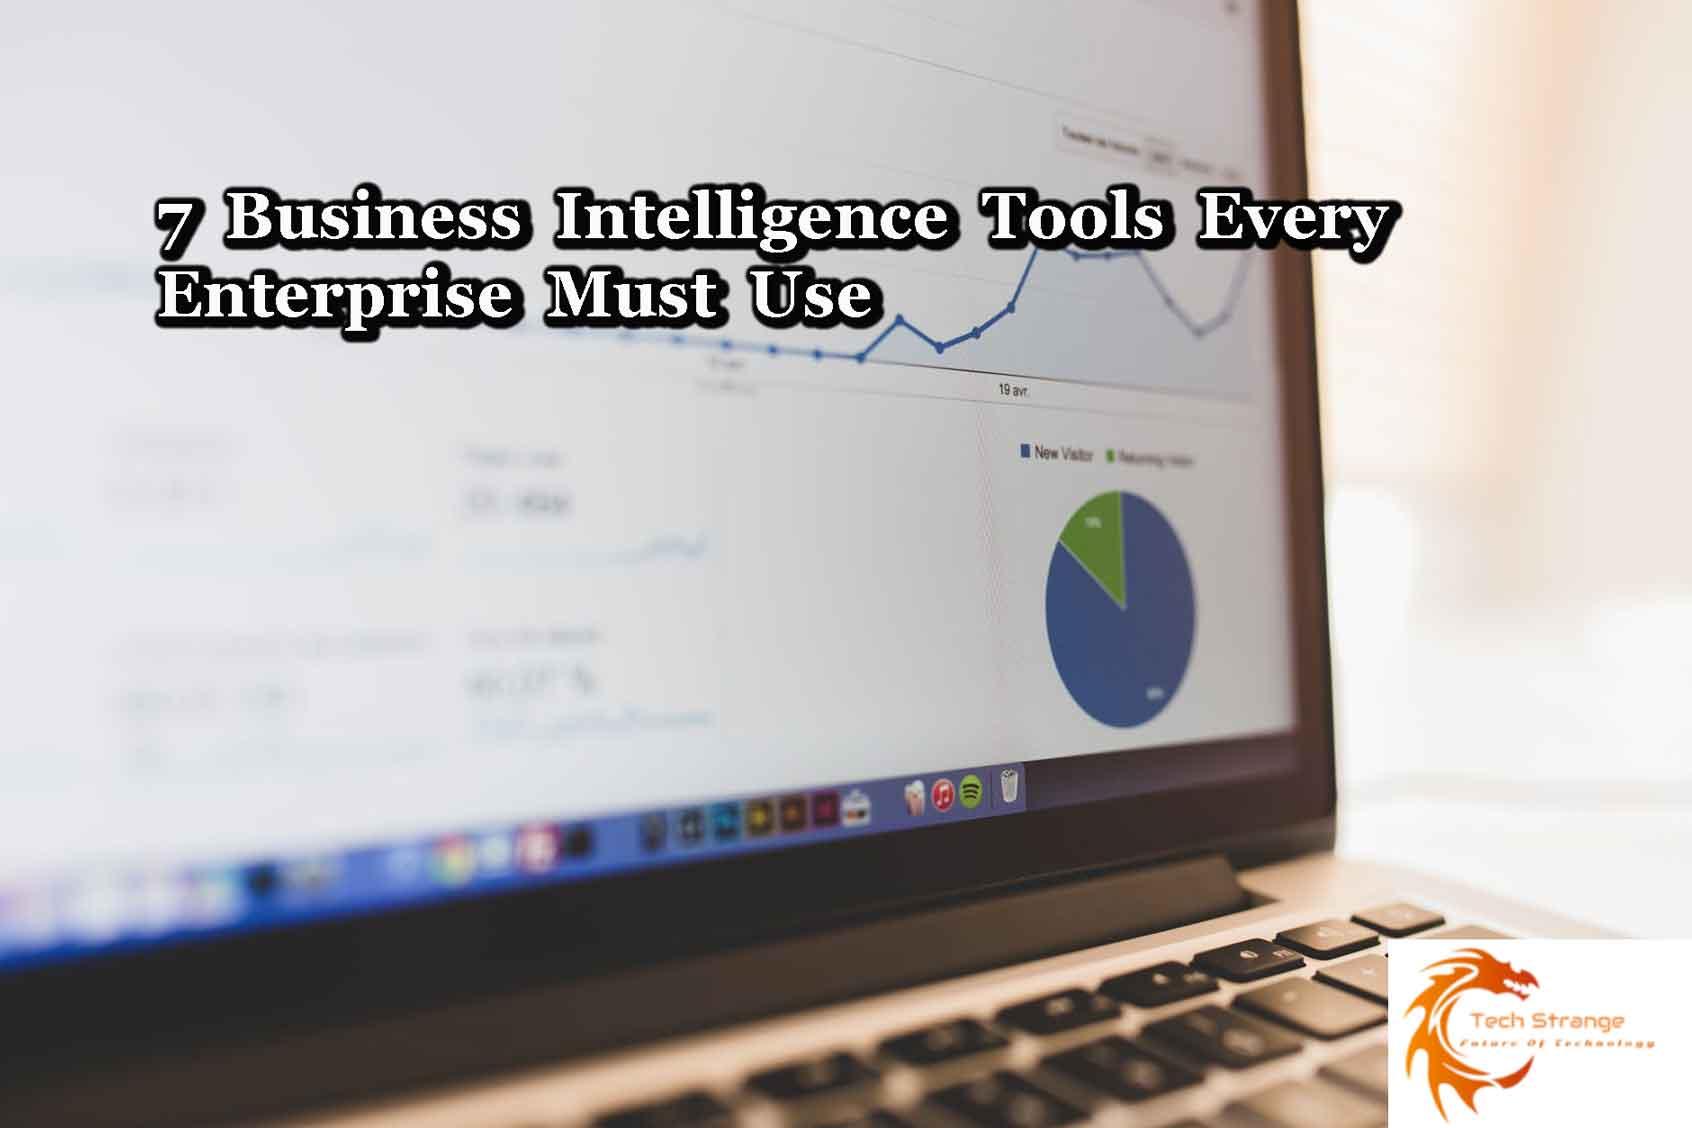 Business-Intelligence-Tools